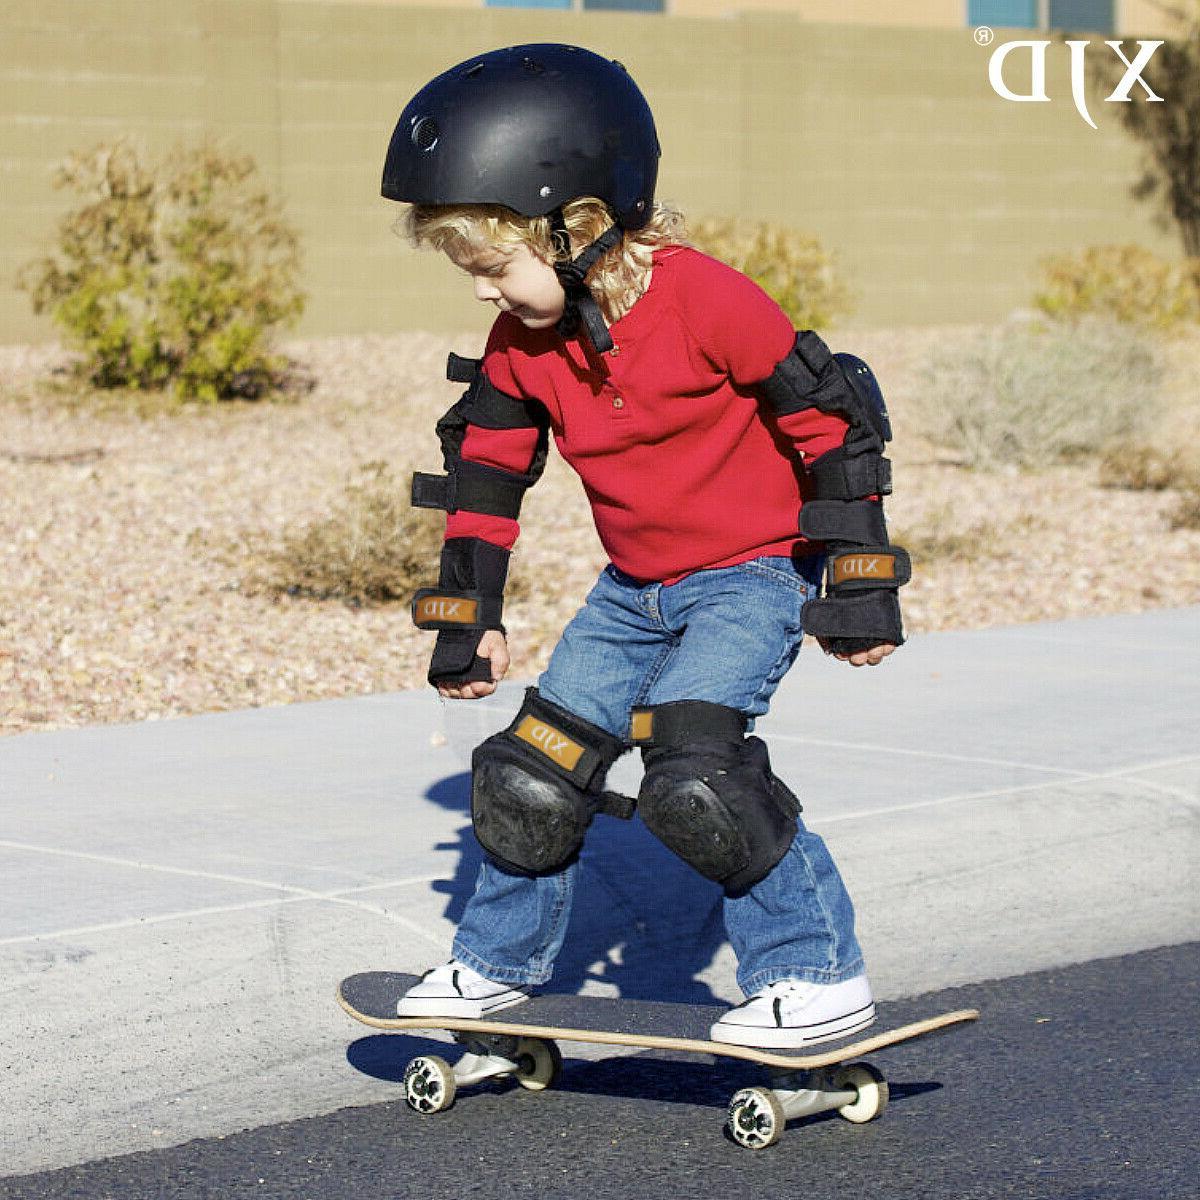 Set 3 Knee Elbow Wrist Skateboard